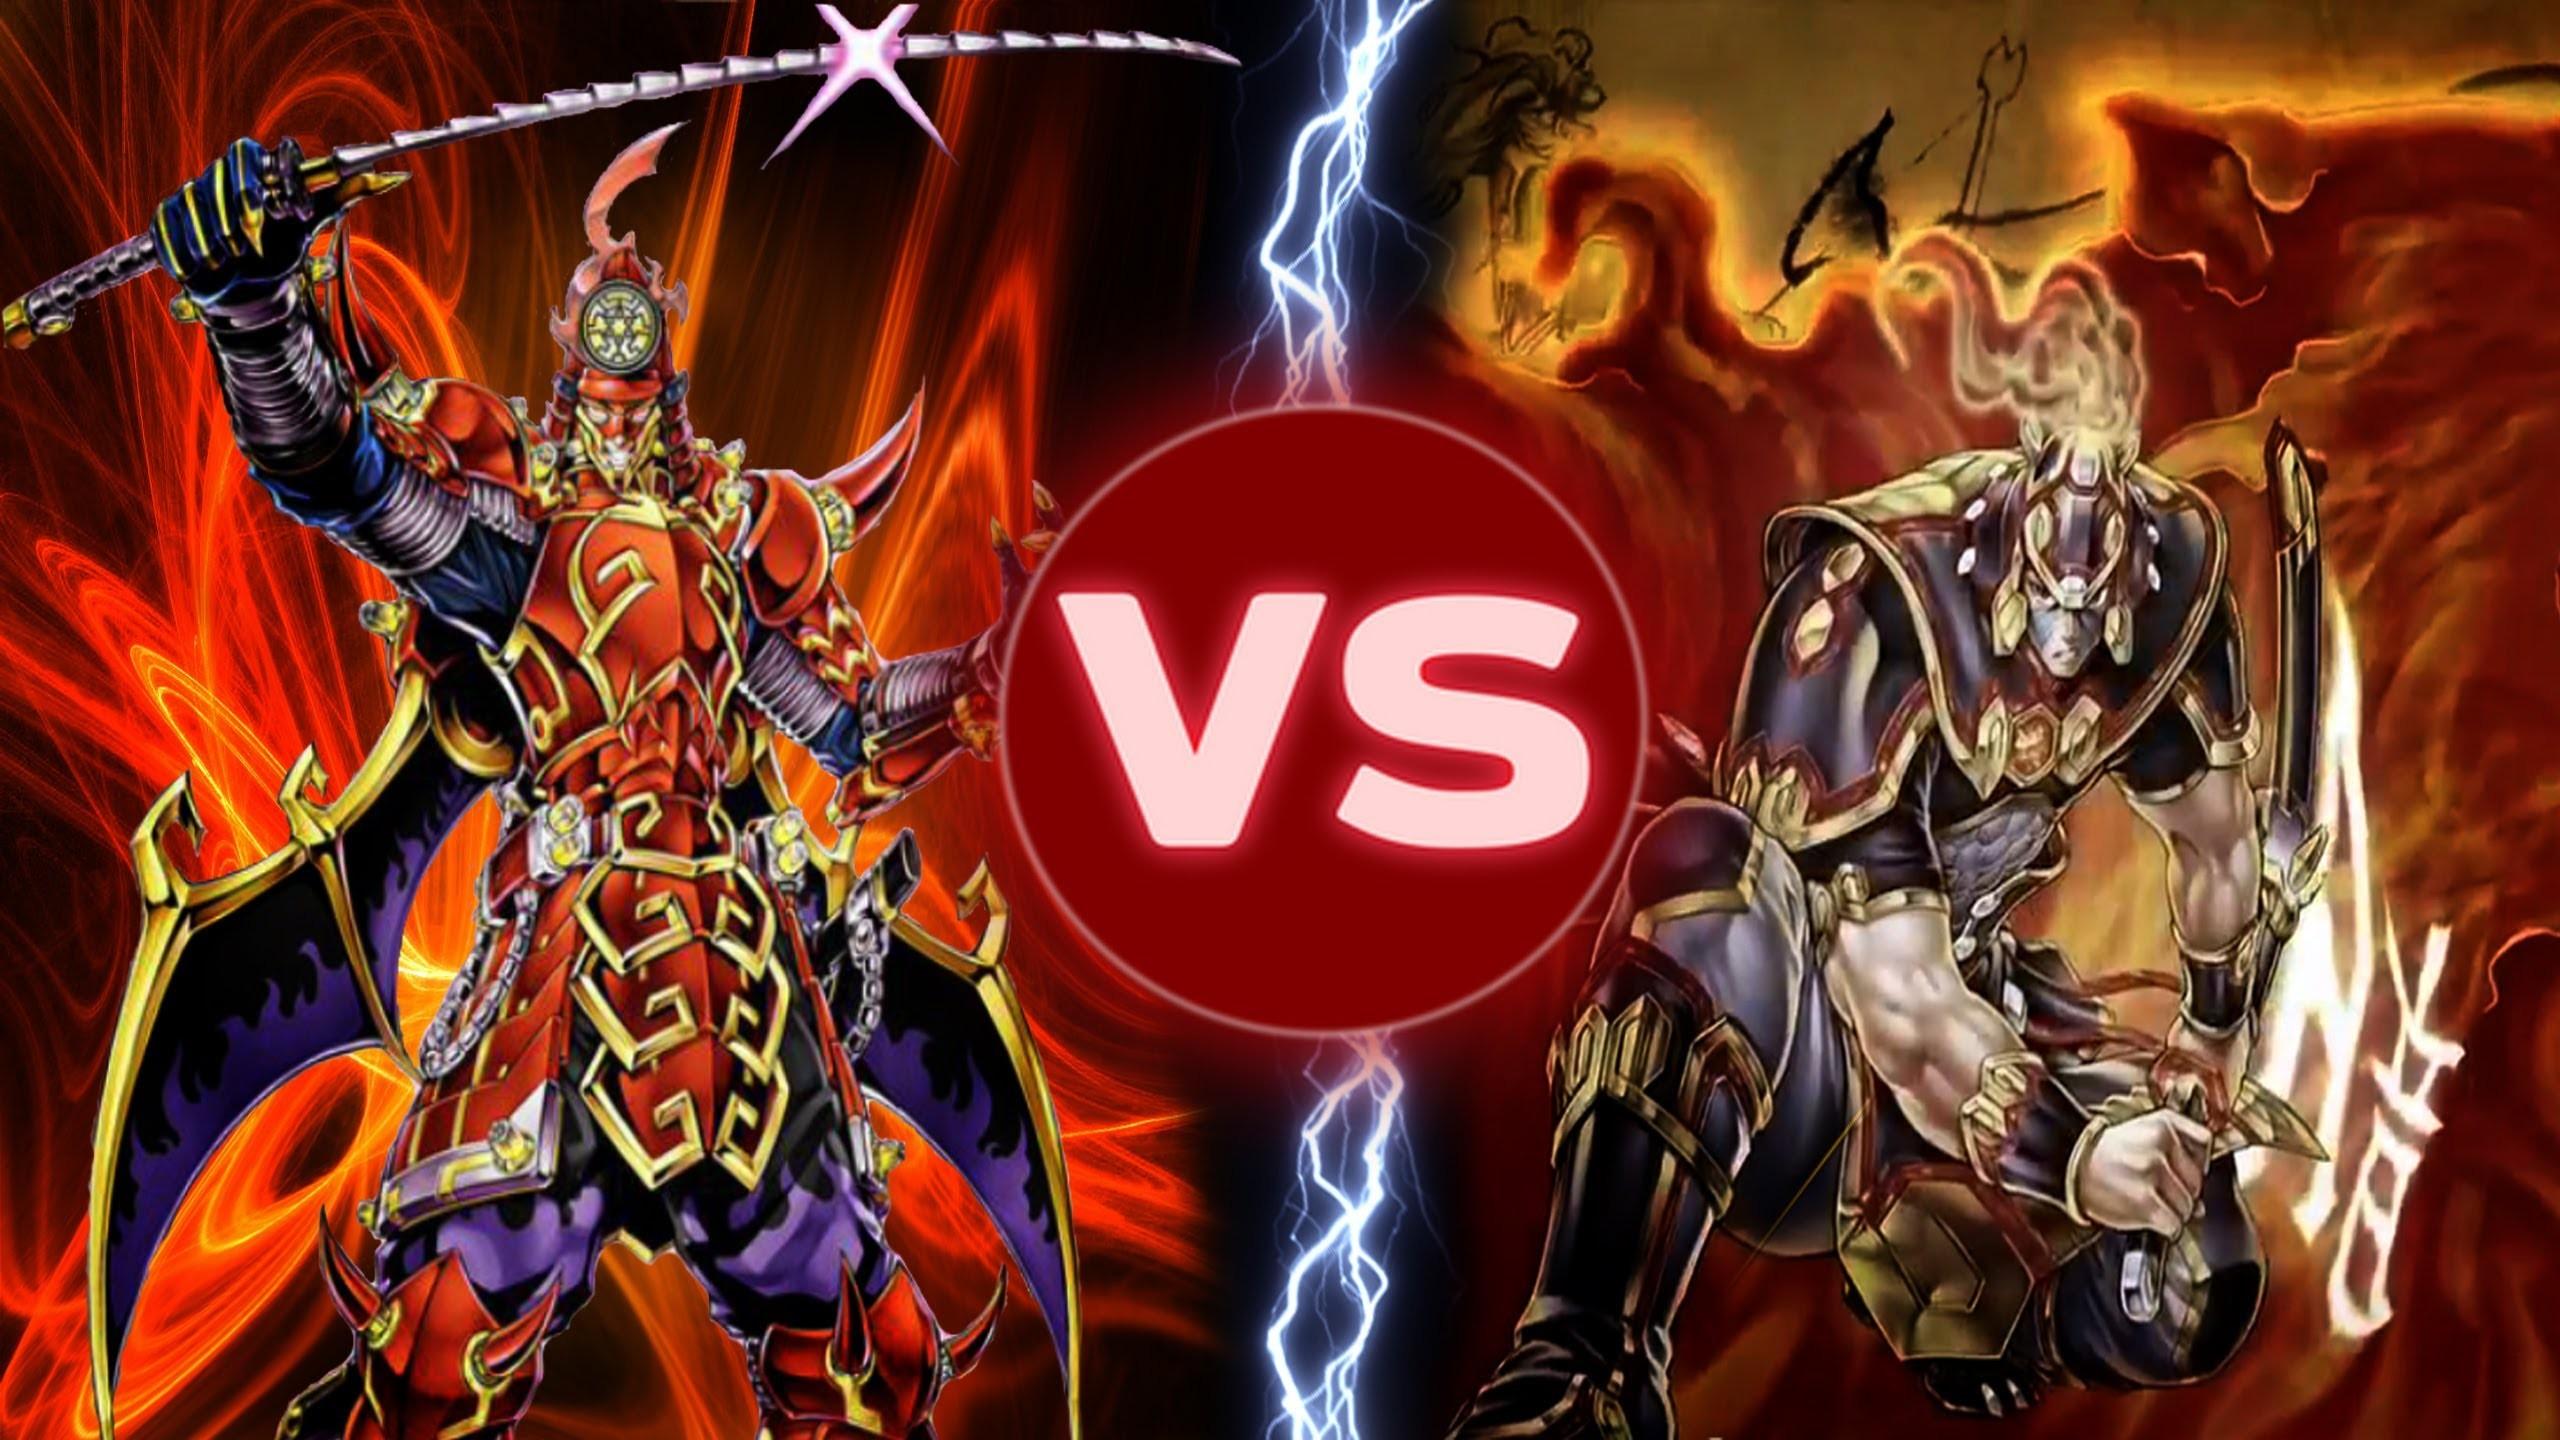 Res: 2560x1440, Yugioh Duel - Six Samurais Vs Fire Fist!! 2013! (Dueling Network) - YouTube